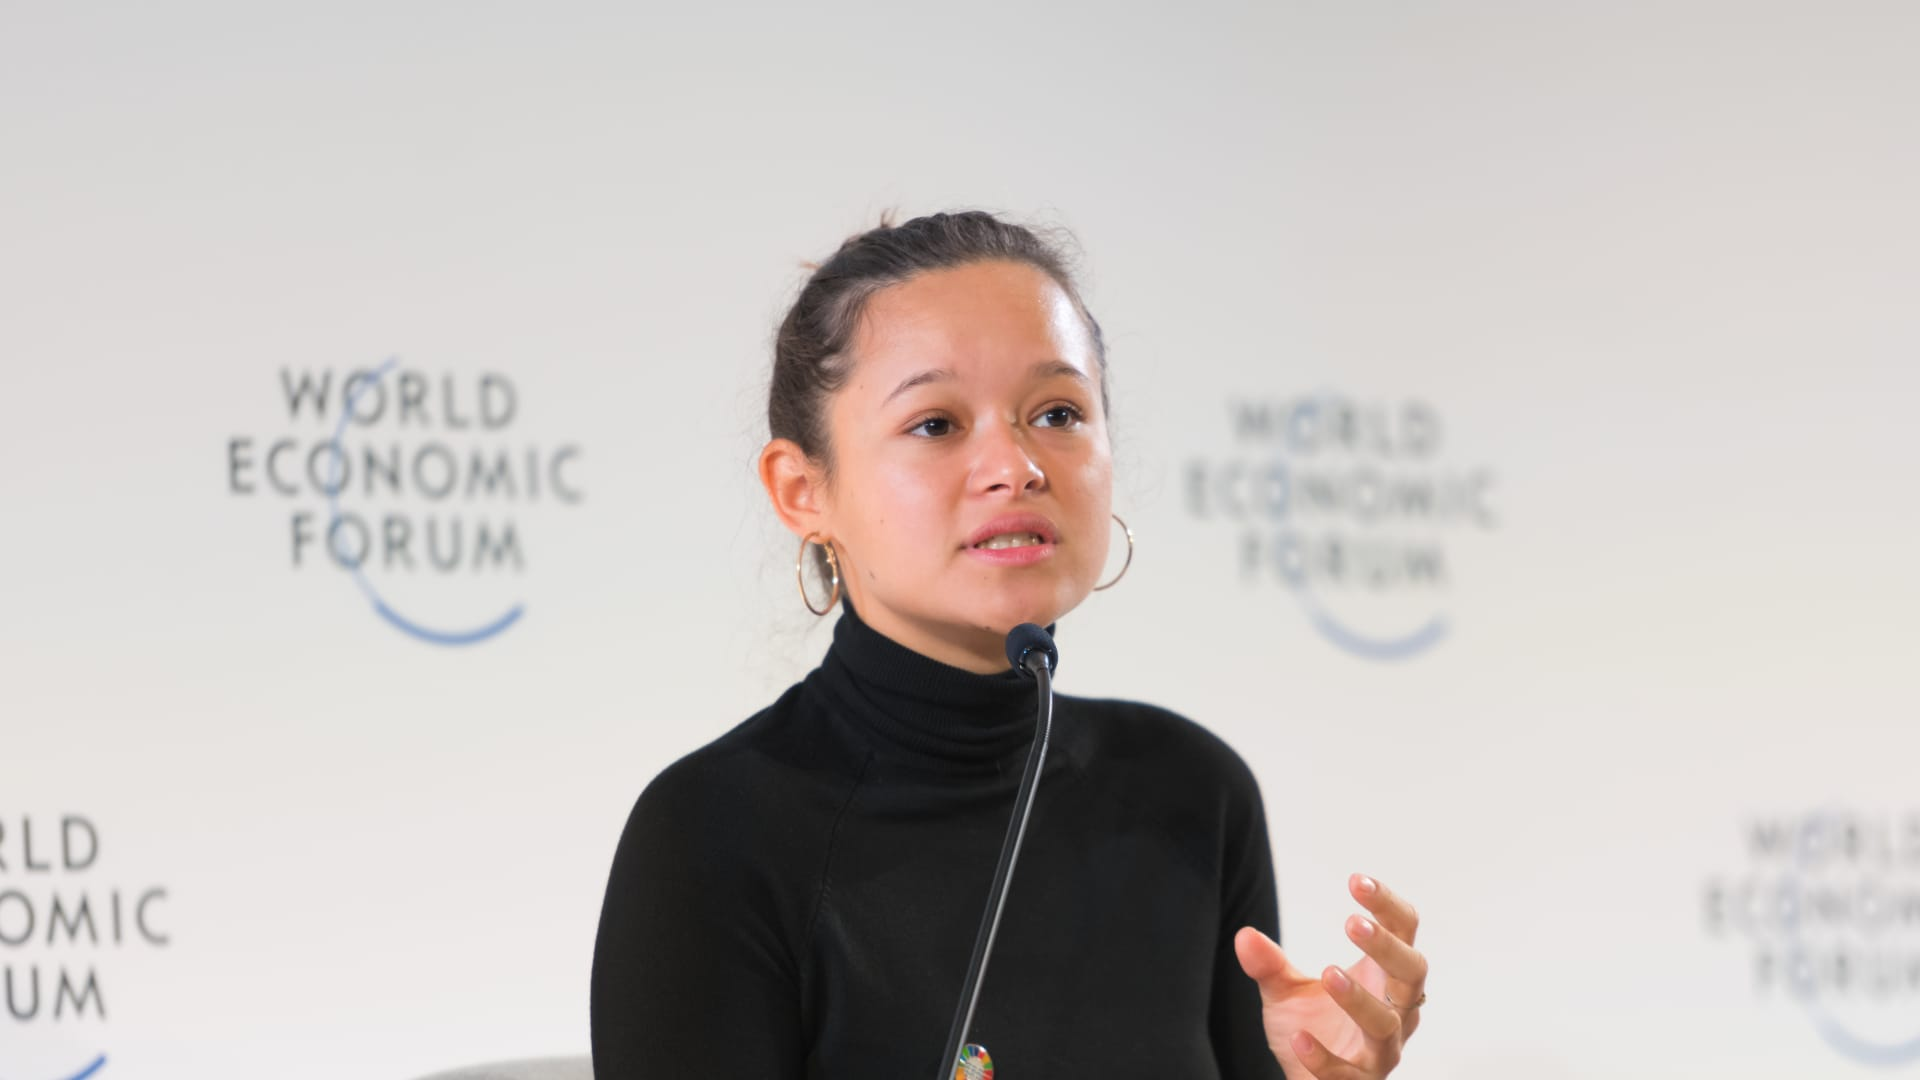 Melati Wijsen, co-founder of Bye Bye Plastic Bags, speaks at the World Economic Forum.